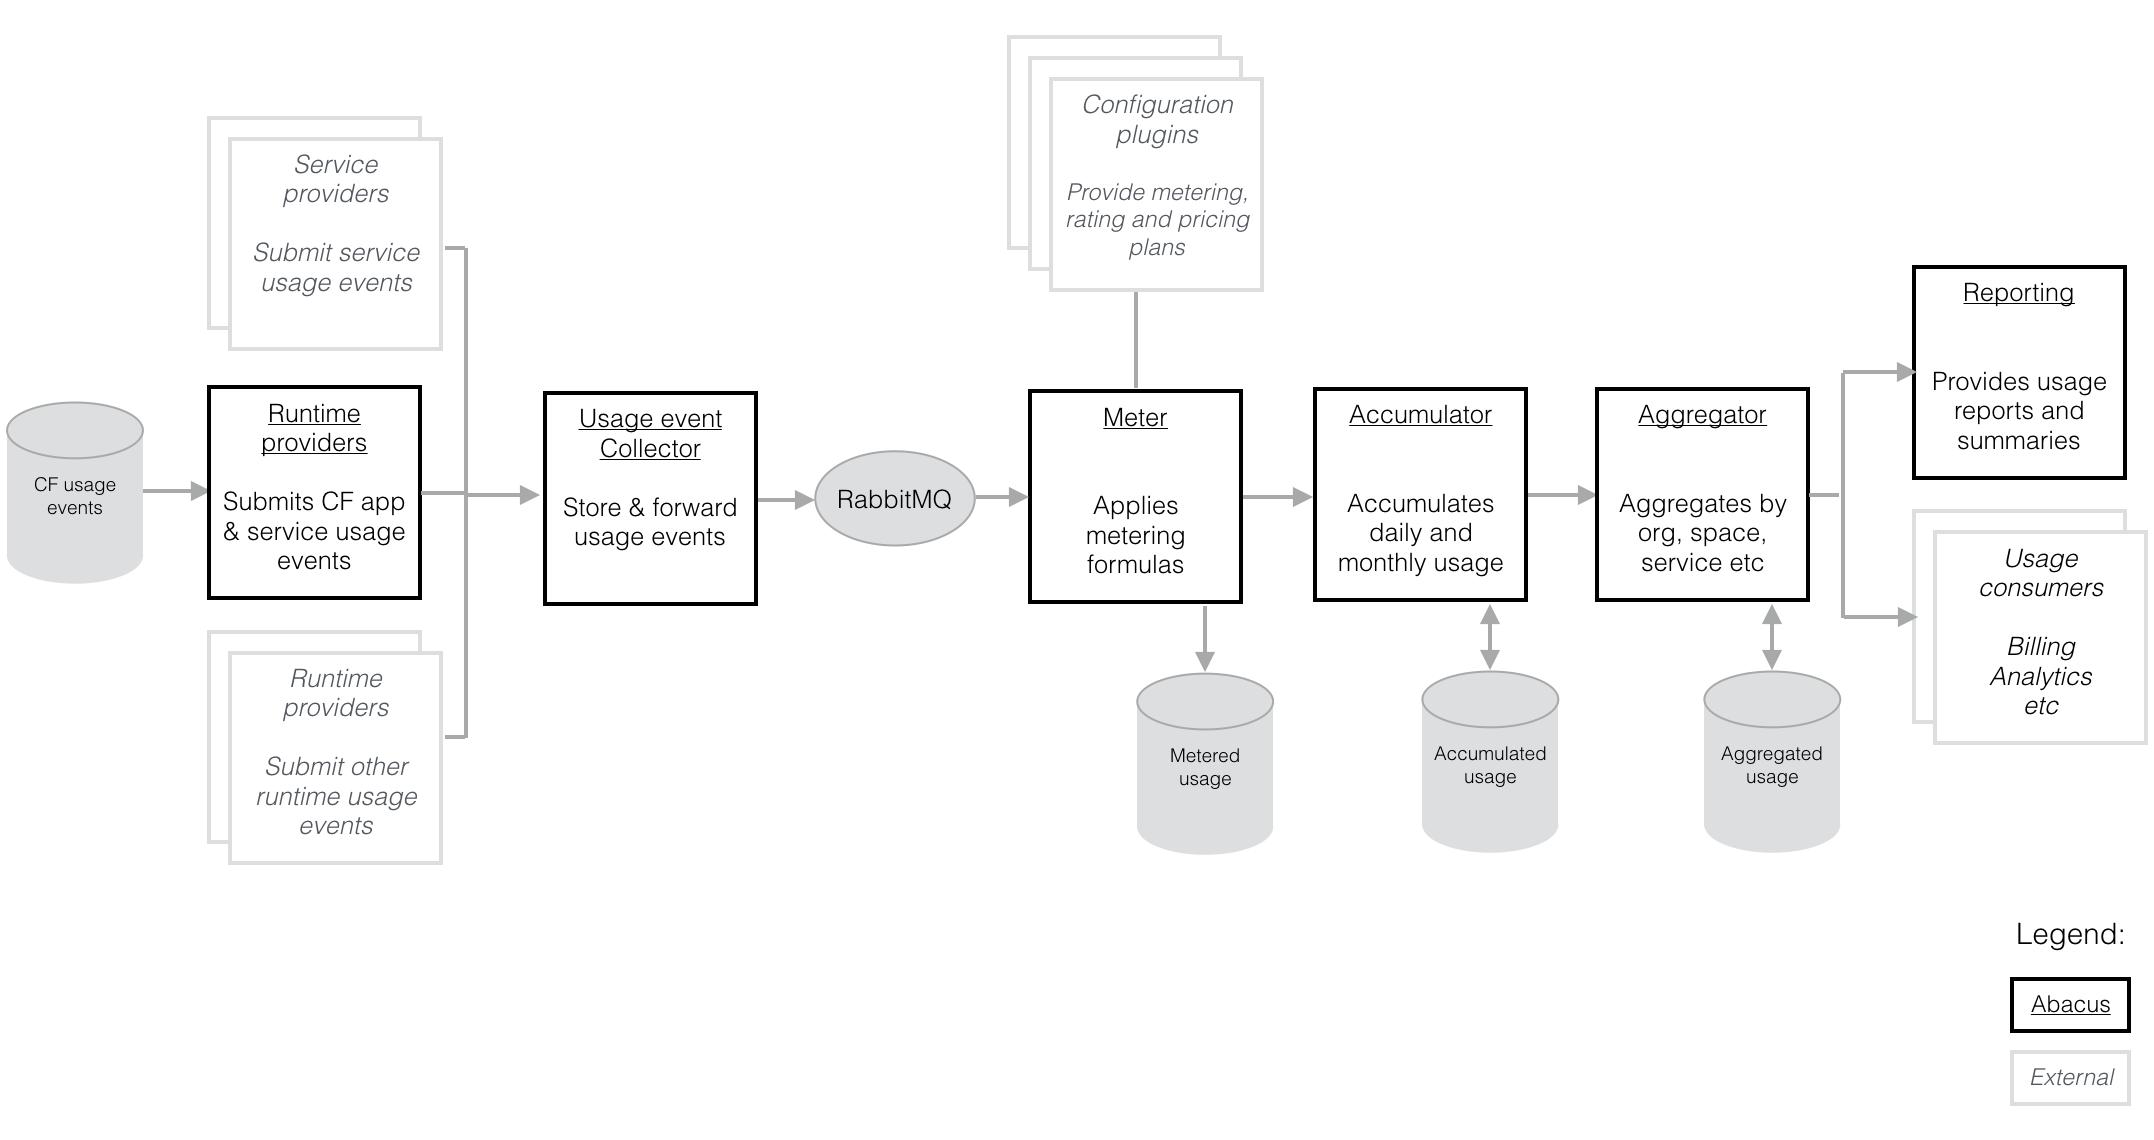 Abacus flow diagram